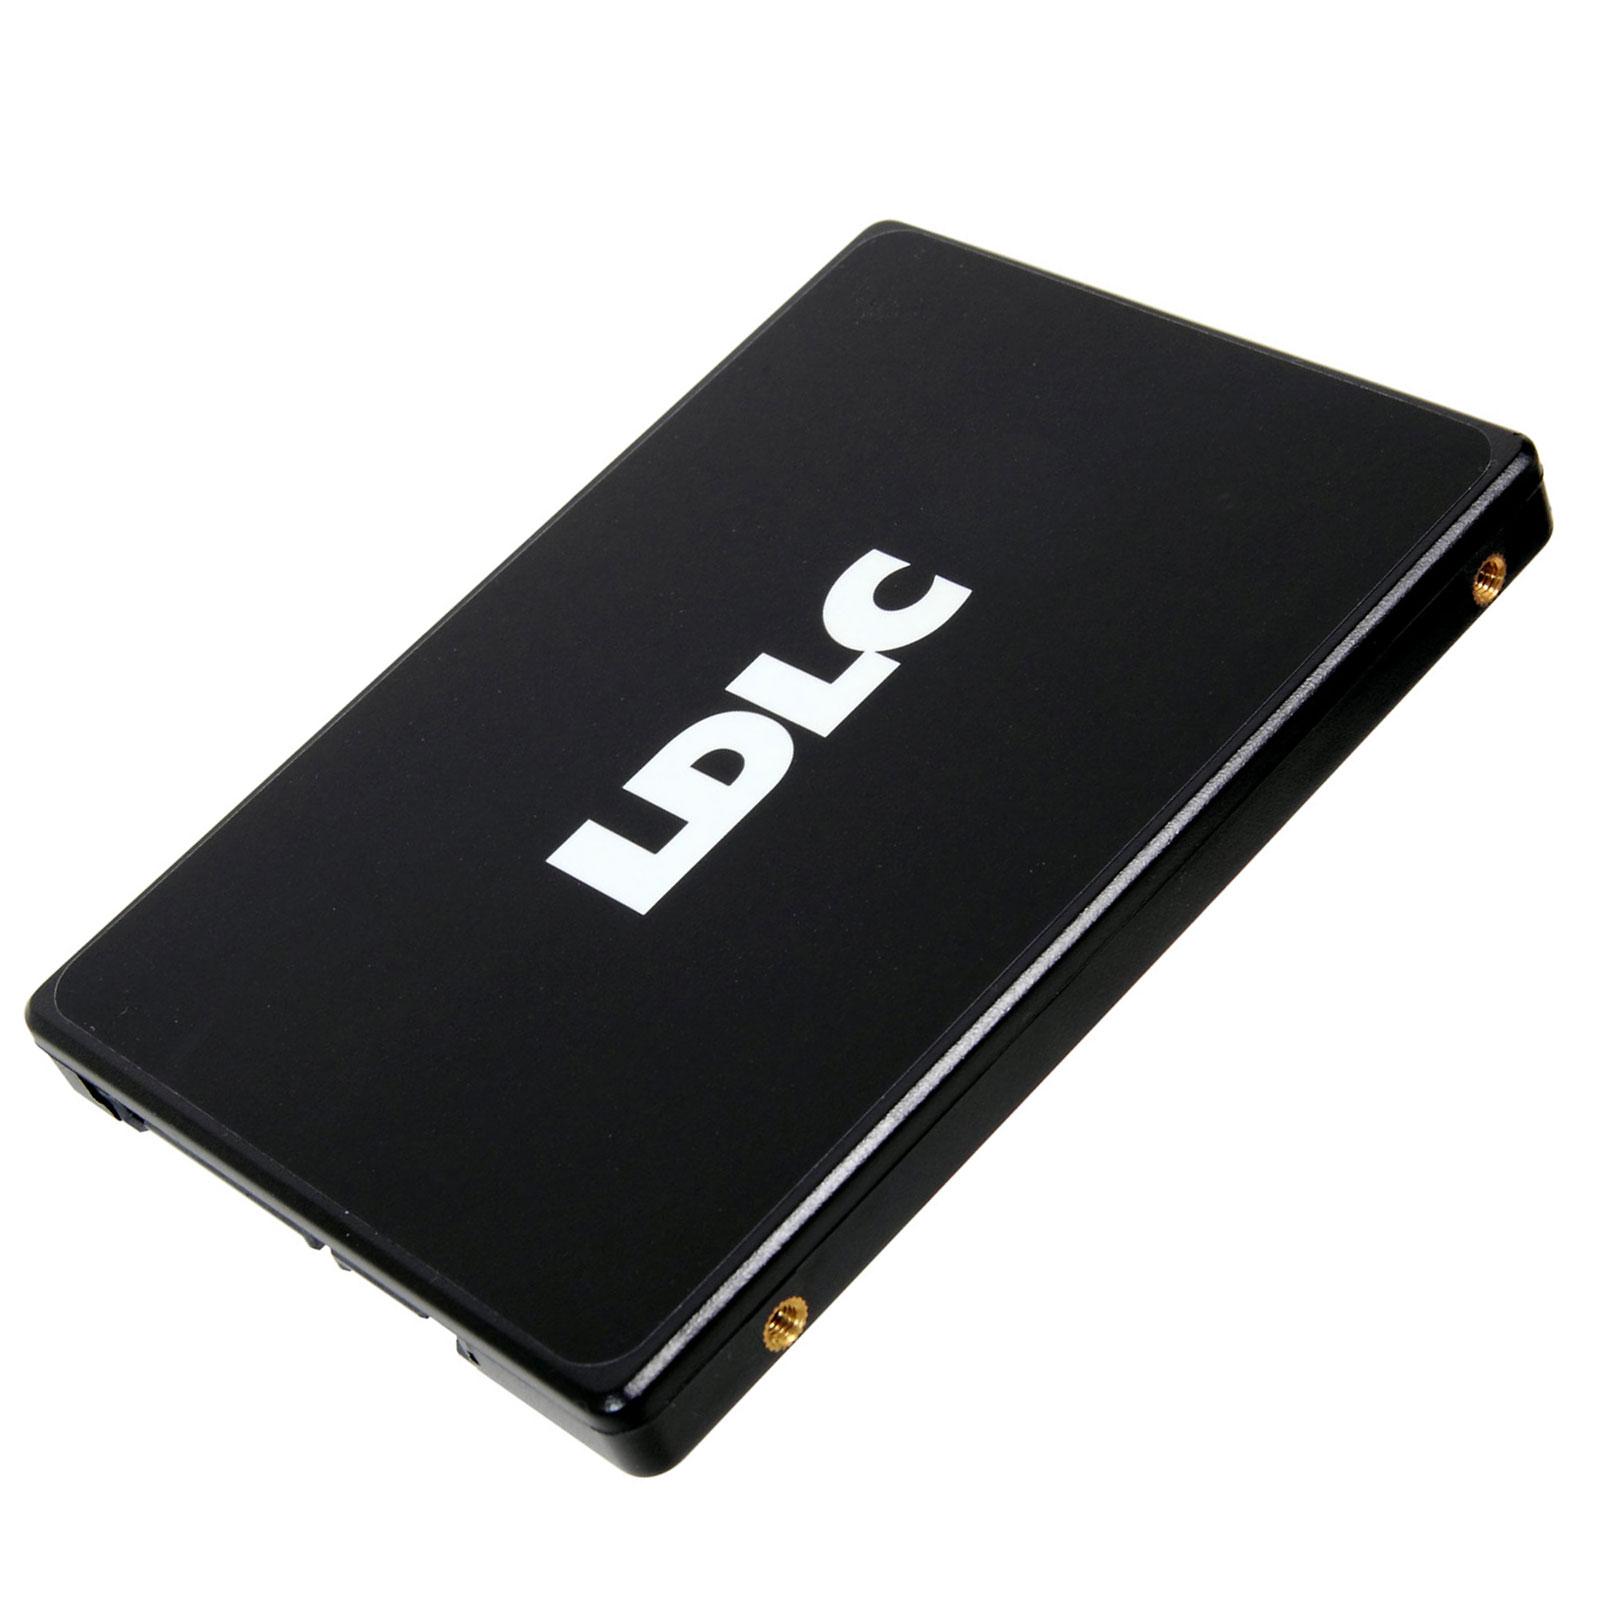 "Disque SSD LDLC SSD F7 PLUS 3D NAND 480 GB SSD 480 Go NAND 3D TLC 2.5"" 7mm Serial ATA 6Gb/s"